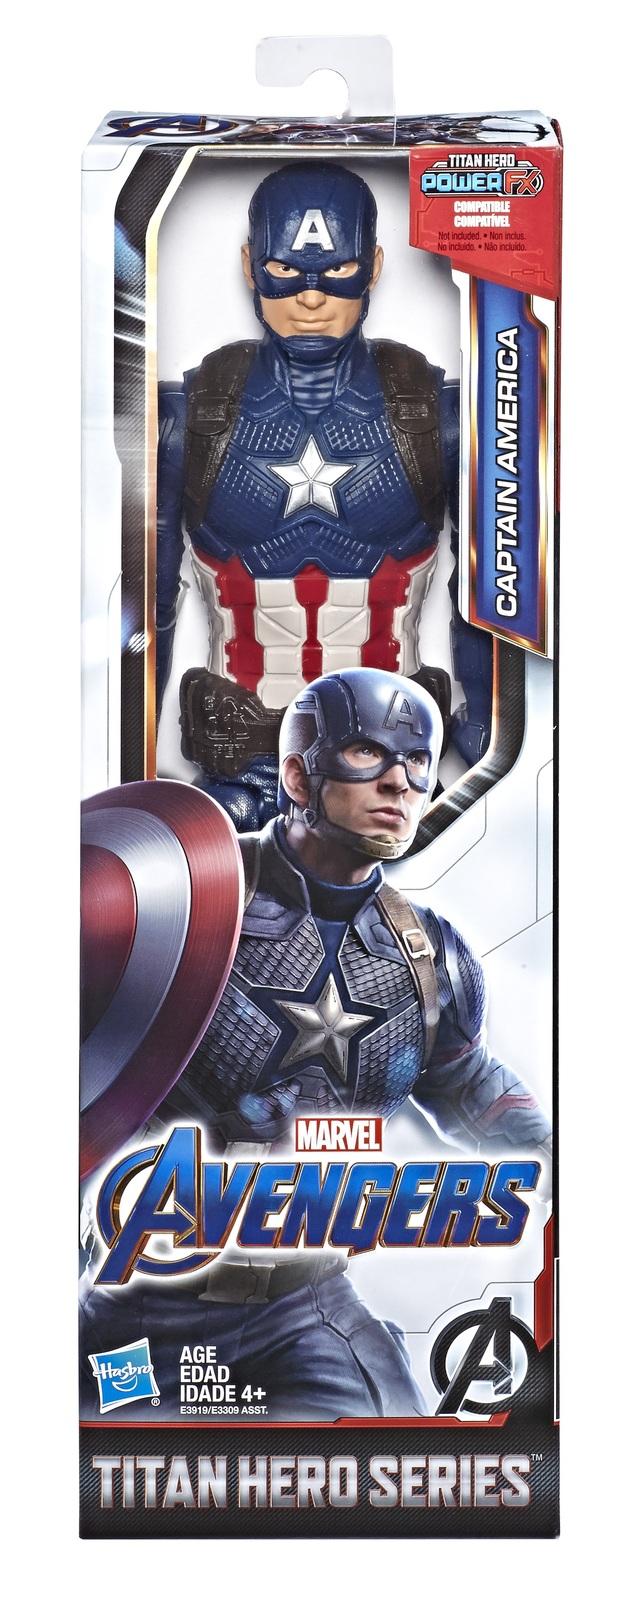 "Avengers Endgame: Captain America - 12"" Titan Hero Figure image"